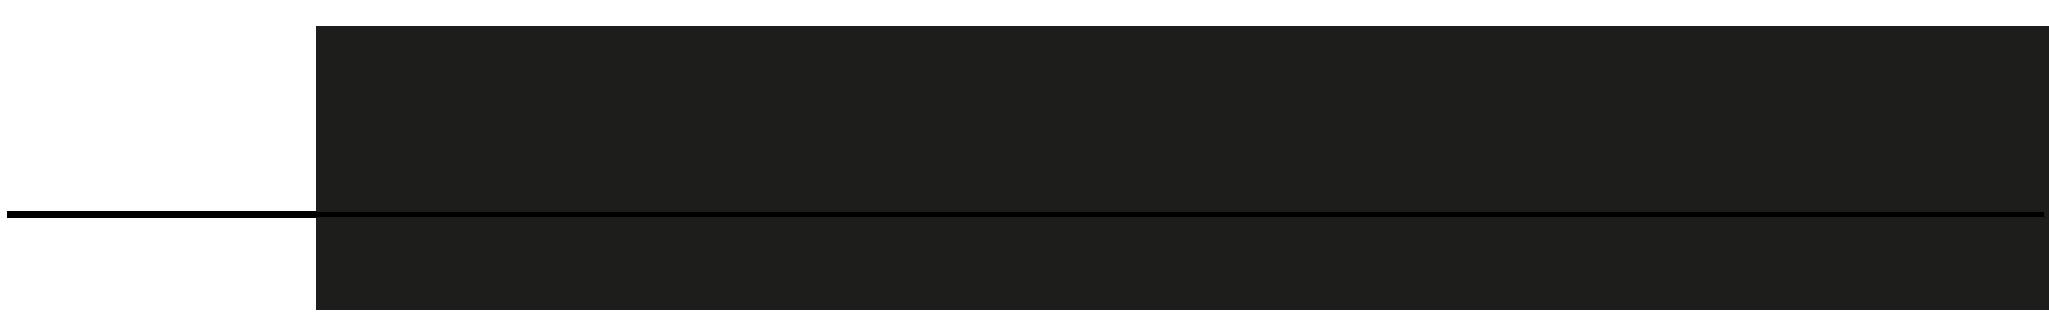 Ullrich & Naumann